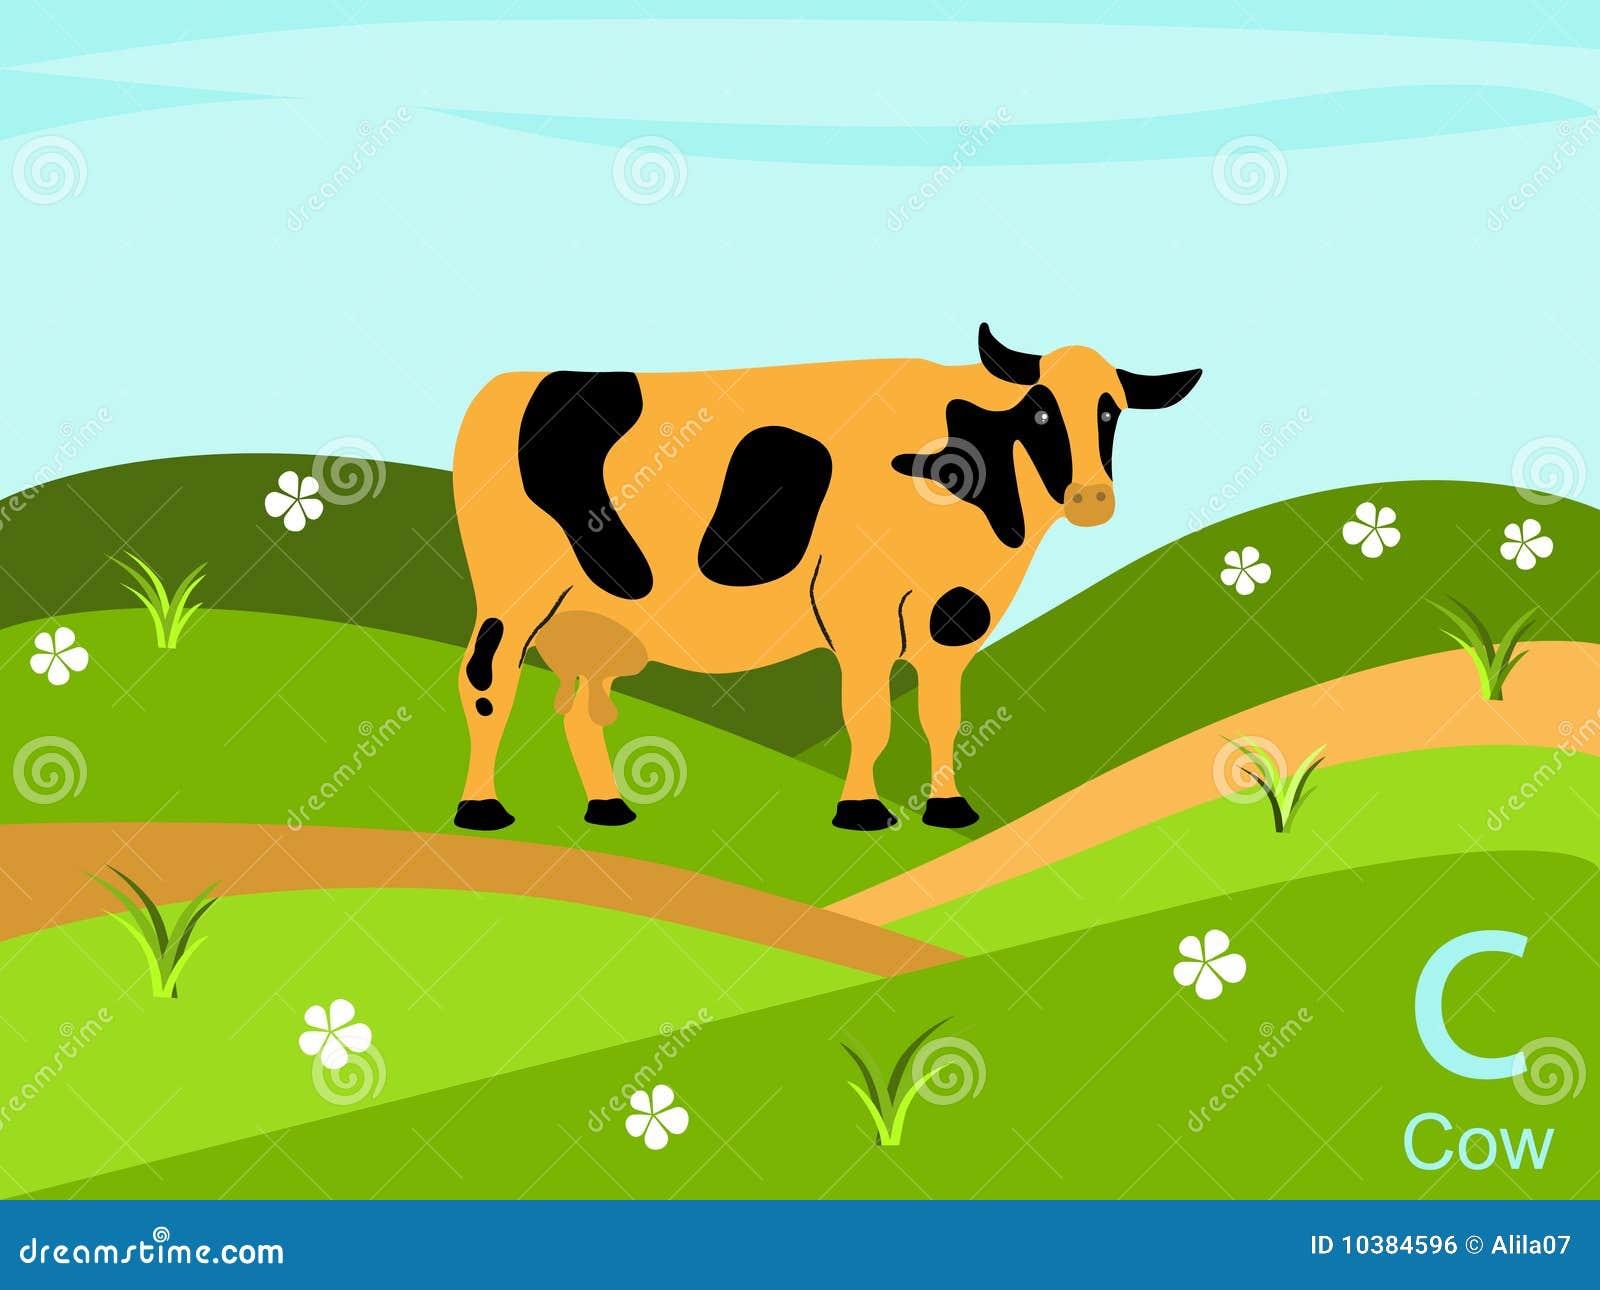 Royalty Free Stock Image Animal Alphabet Flash Card C Cow Image10384596 on Animal Habitat Preschool Art